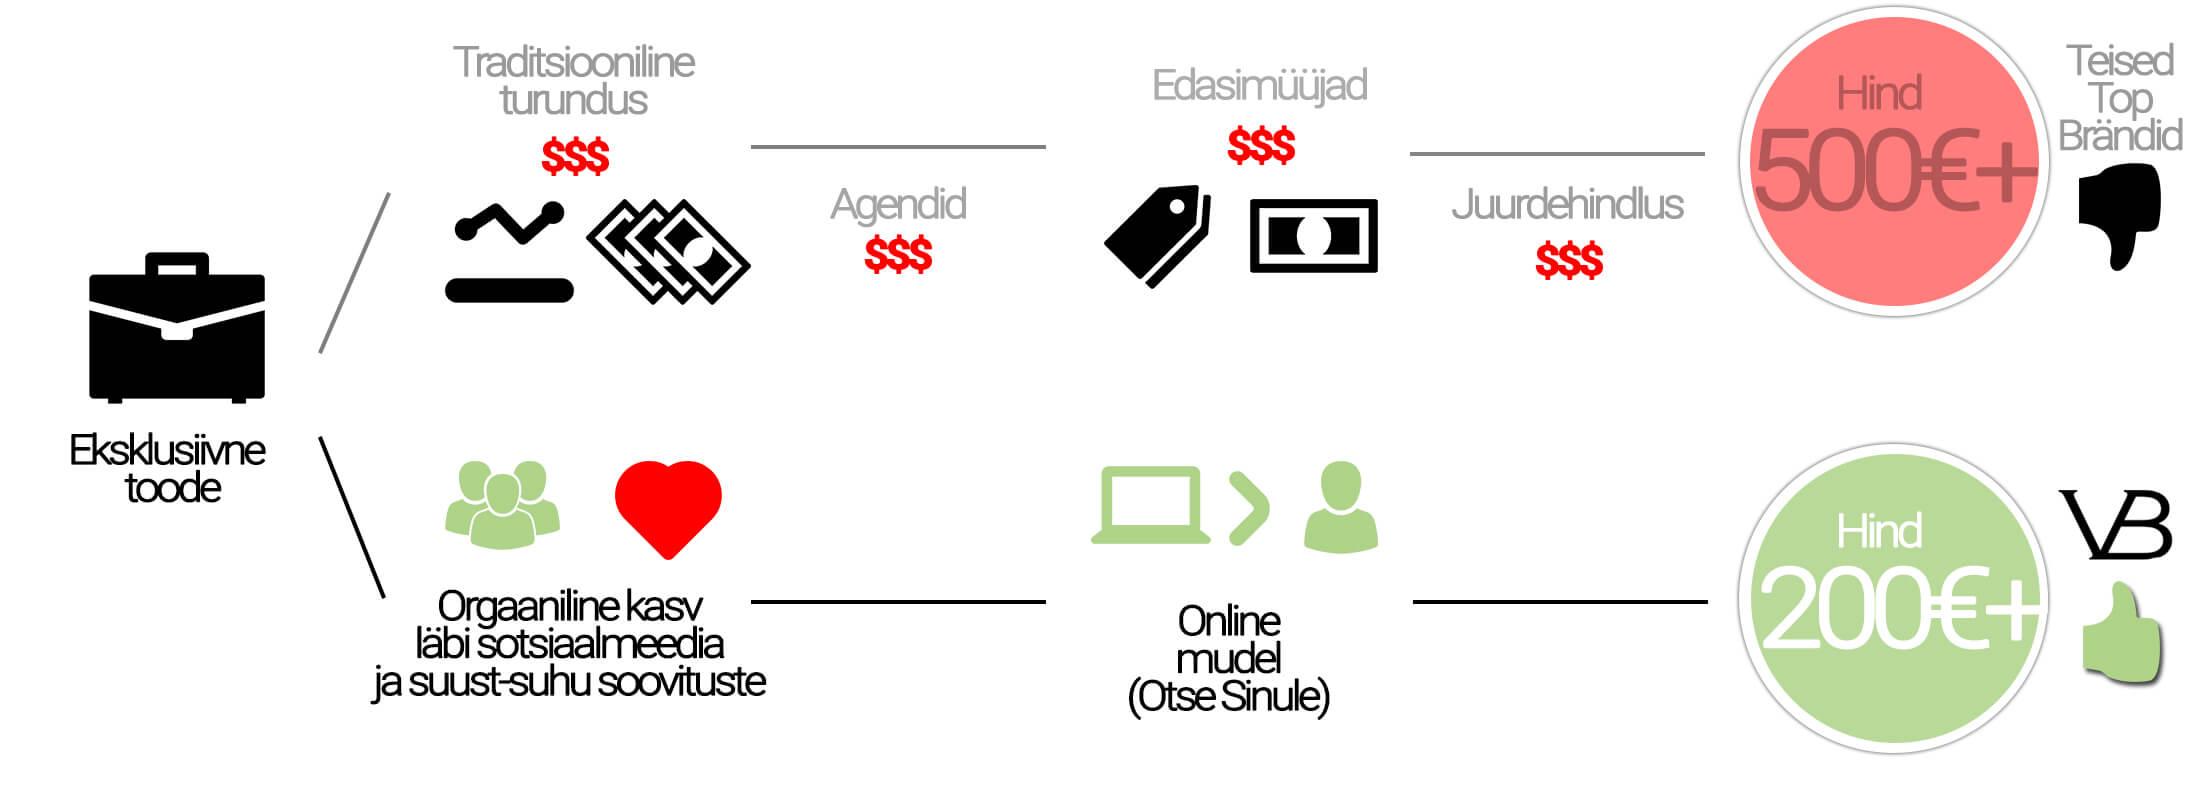 infograafik-von-baer-2